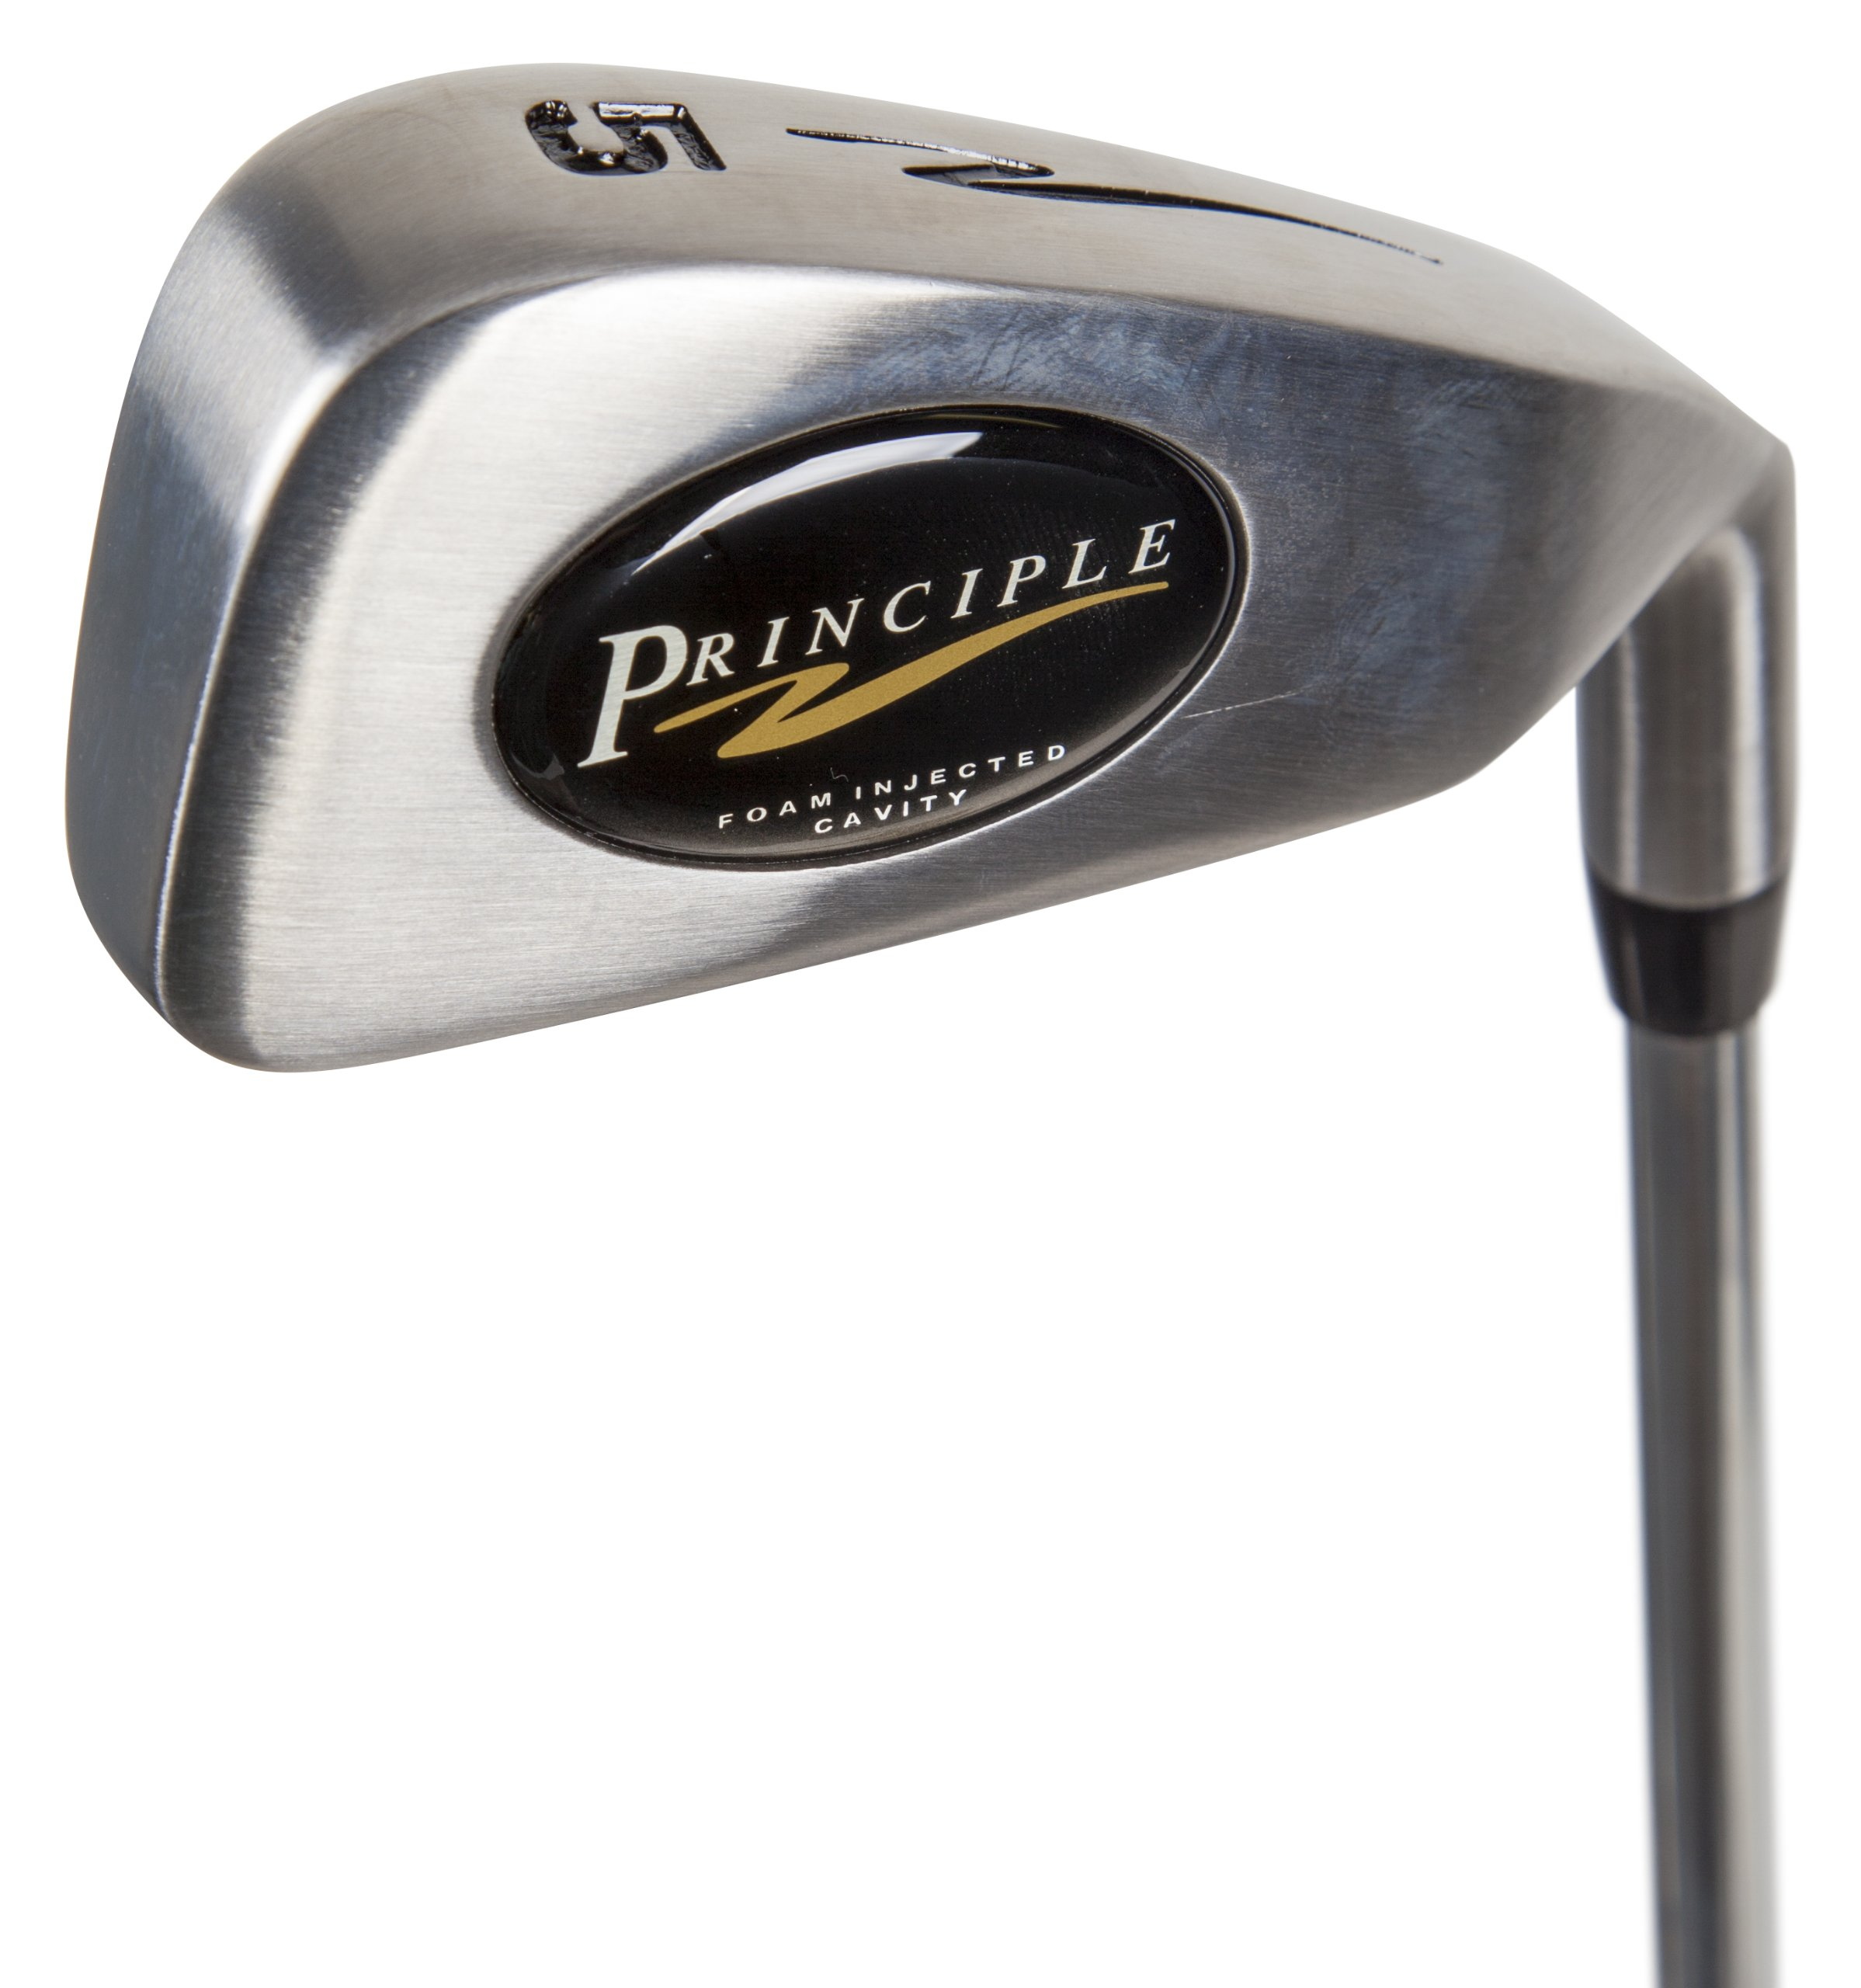 Principle Golf Men's Foam Cavity PW Iron, Right Hand, Steel, Regular